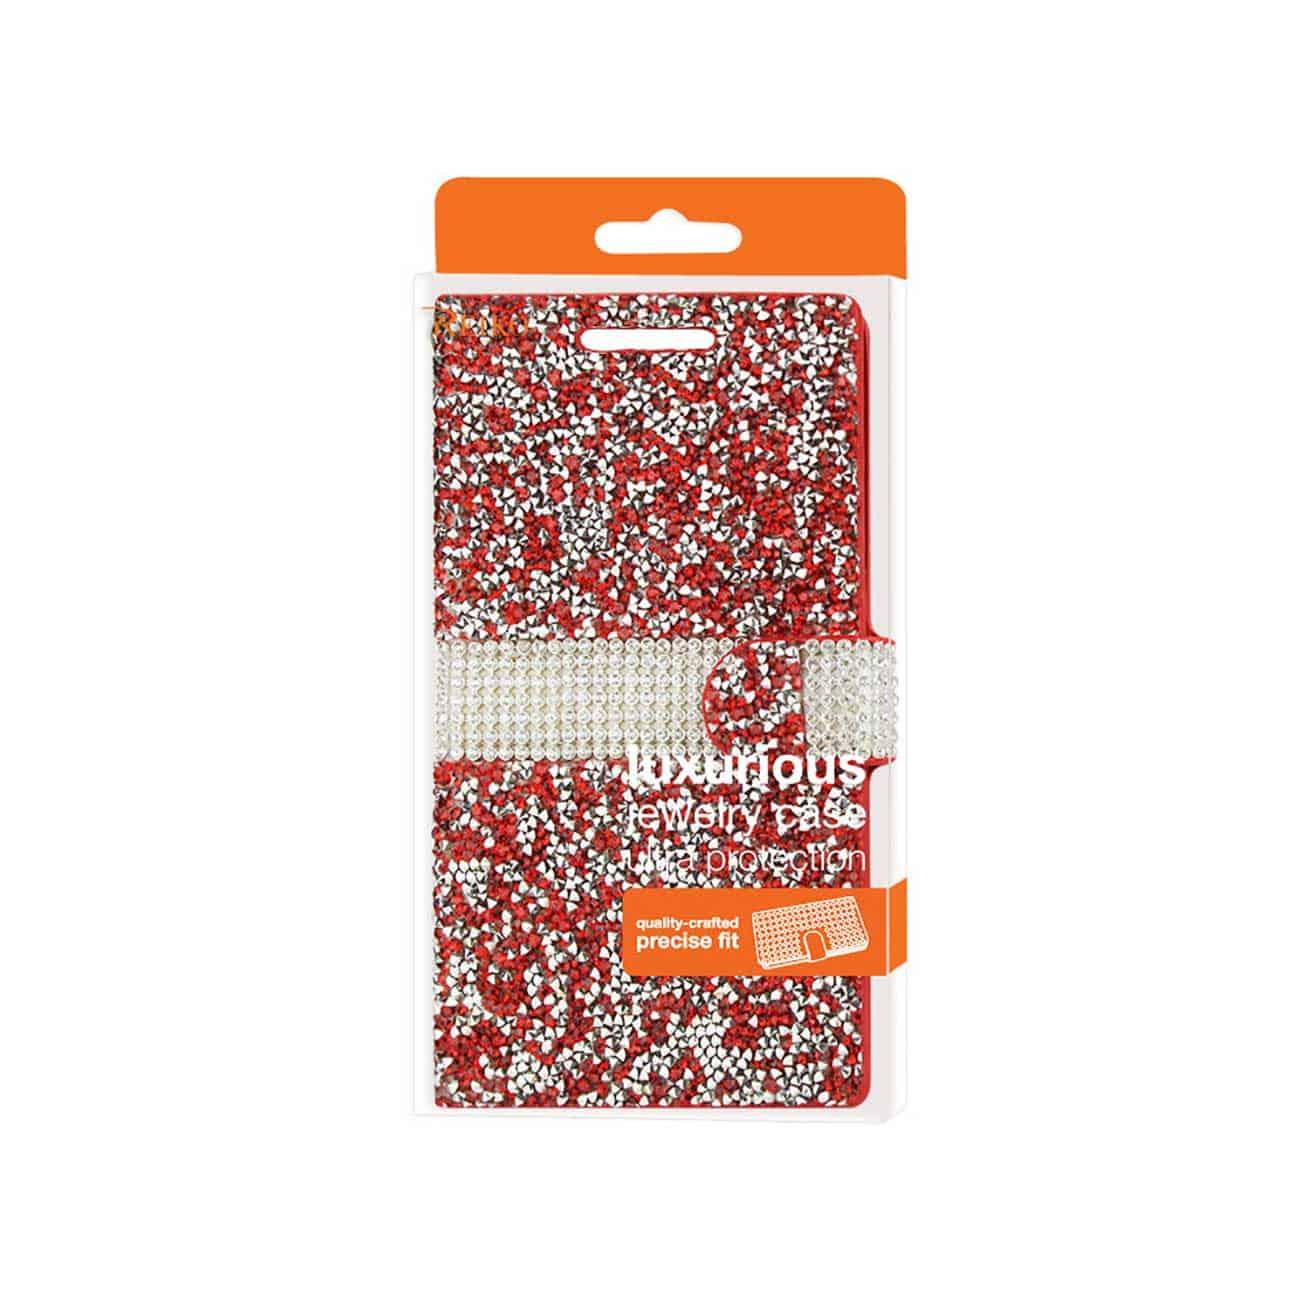 HTC ONE A9 JEWELRY RHINESTONE WALLET CASE IN RED